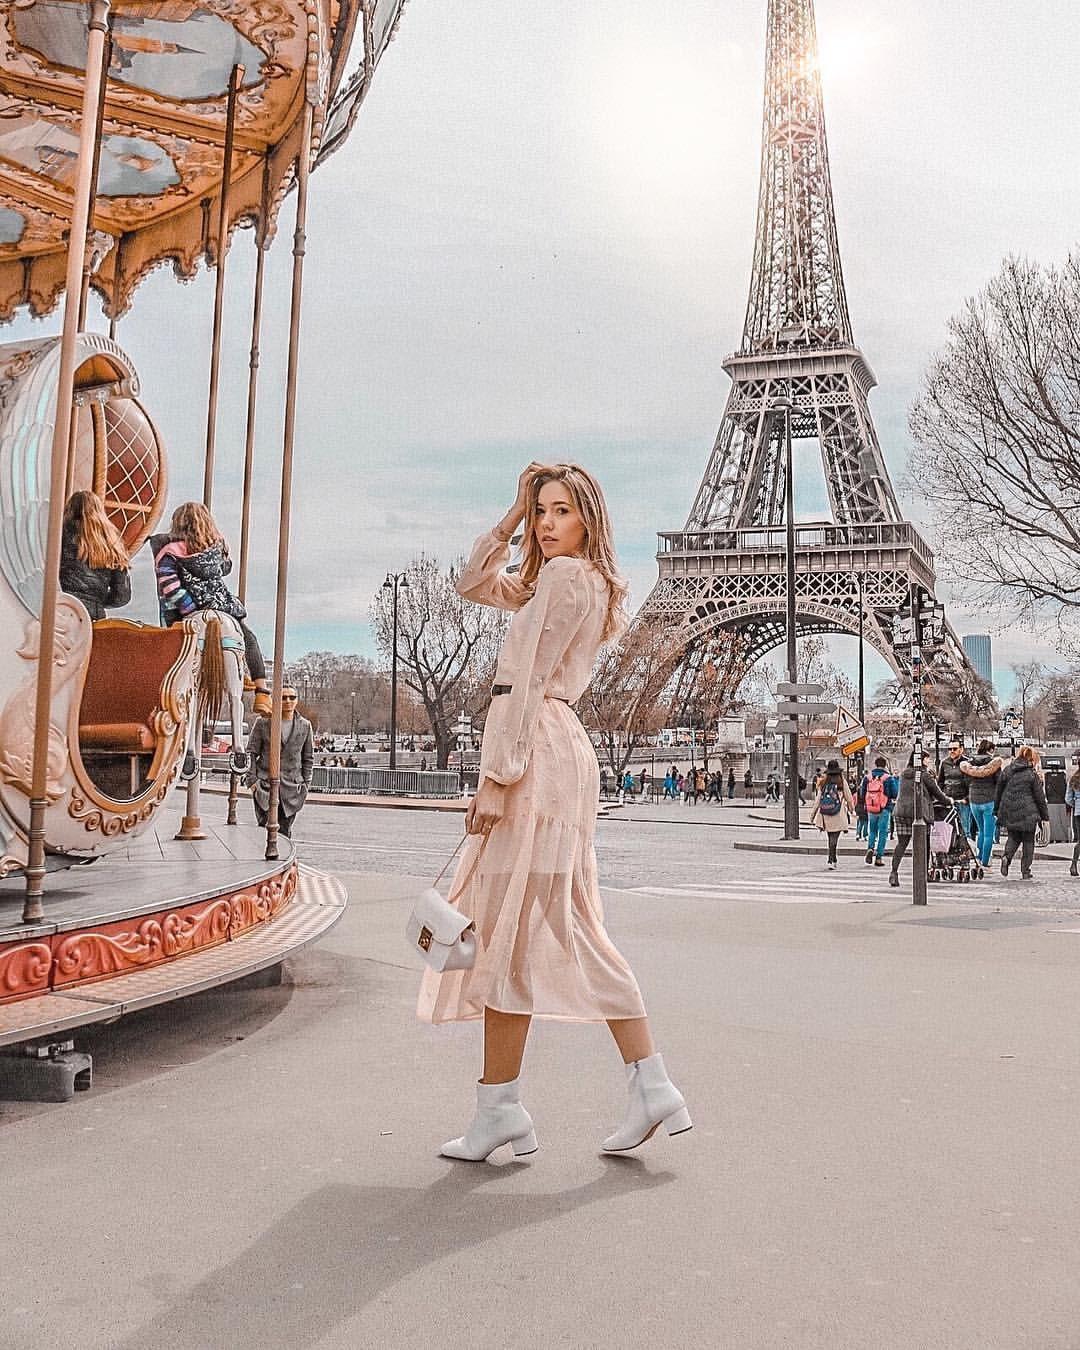 "INSPO • TRAVEL • FASHION on Instagram: ""Werbung, da Verlinkung  My favorite place … 💗 happy friday meine Lieben 💕 #fashionblogger #fashionblogger_de #syleblogger #germanblogger…"""